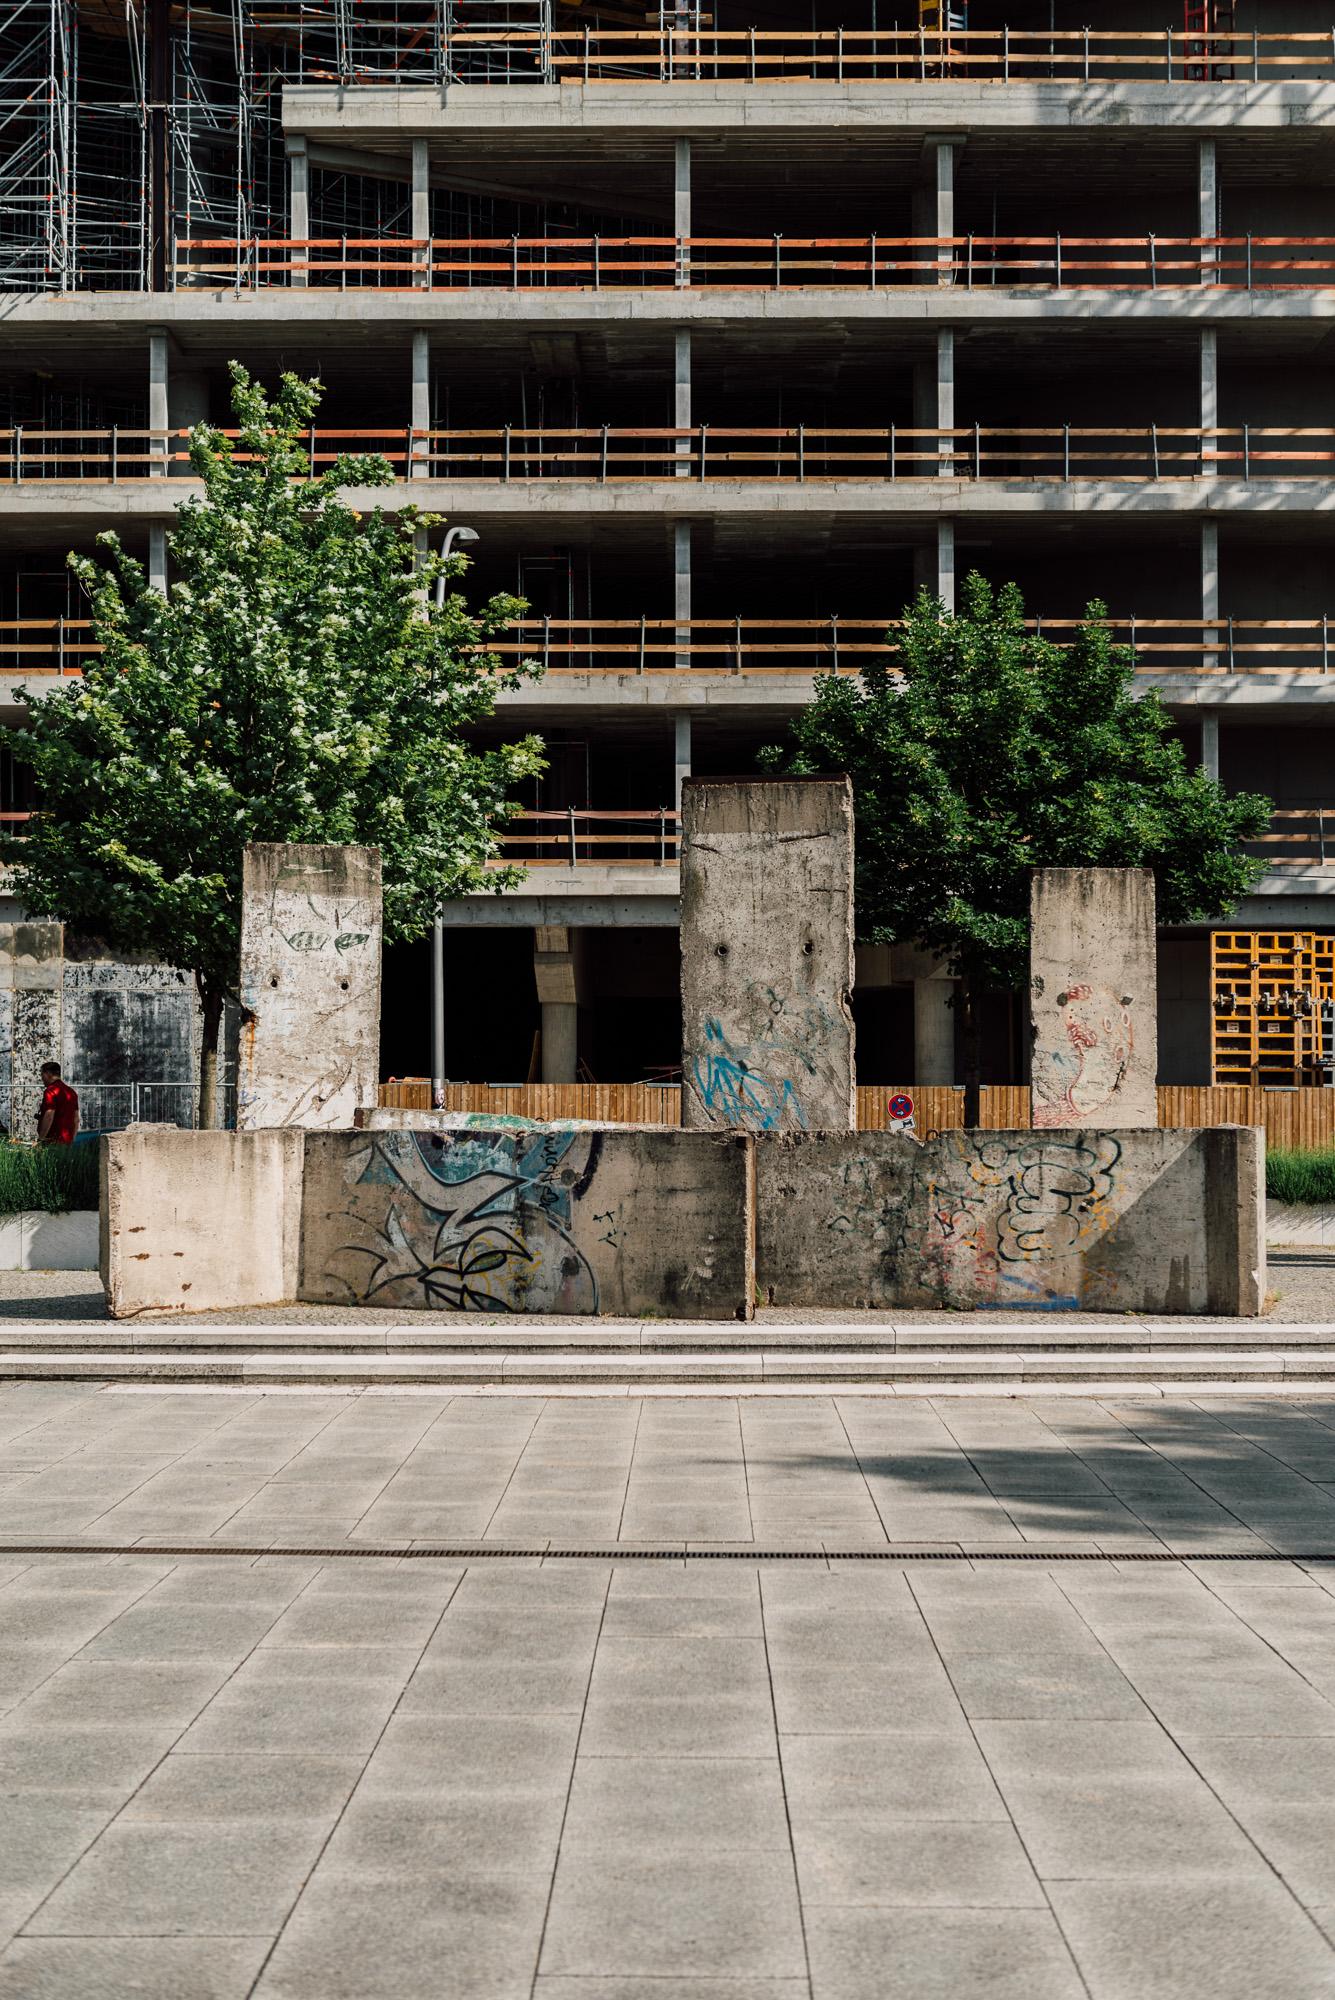 ignant-berlin-wall-biennale-4983